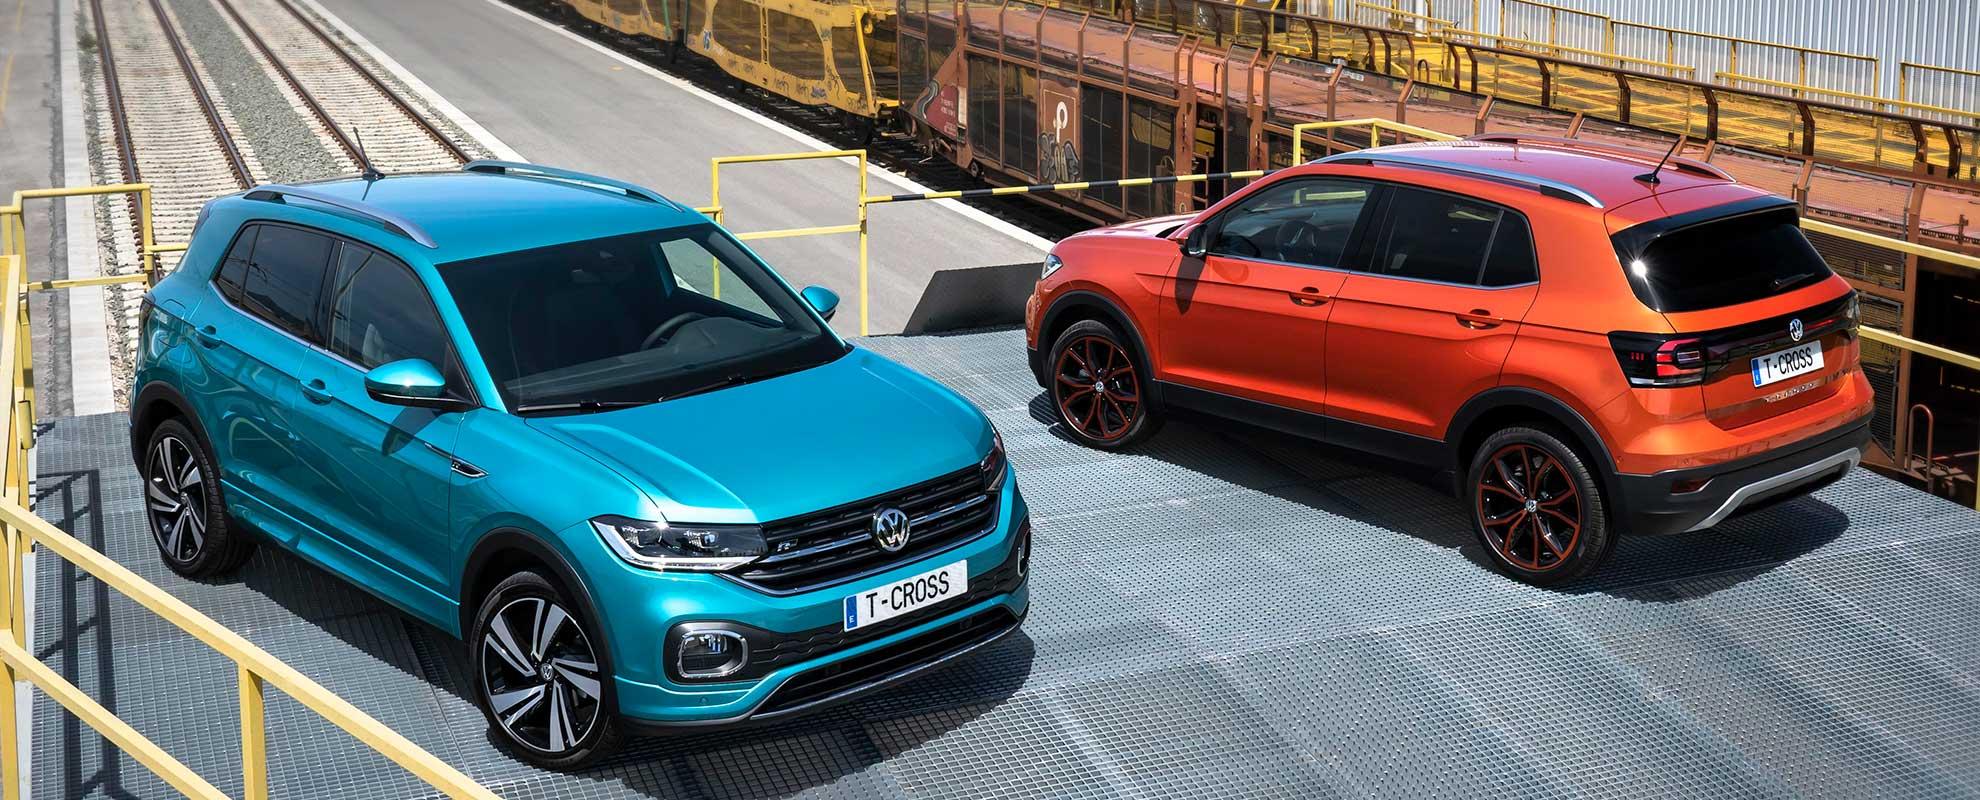 Volkswagen TCROSS zaragoza oferta